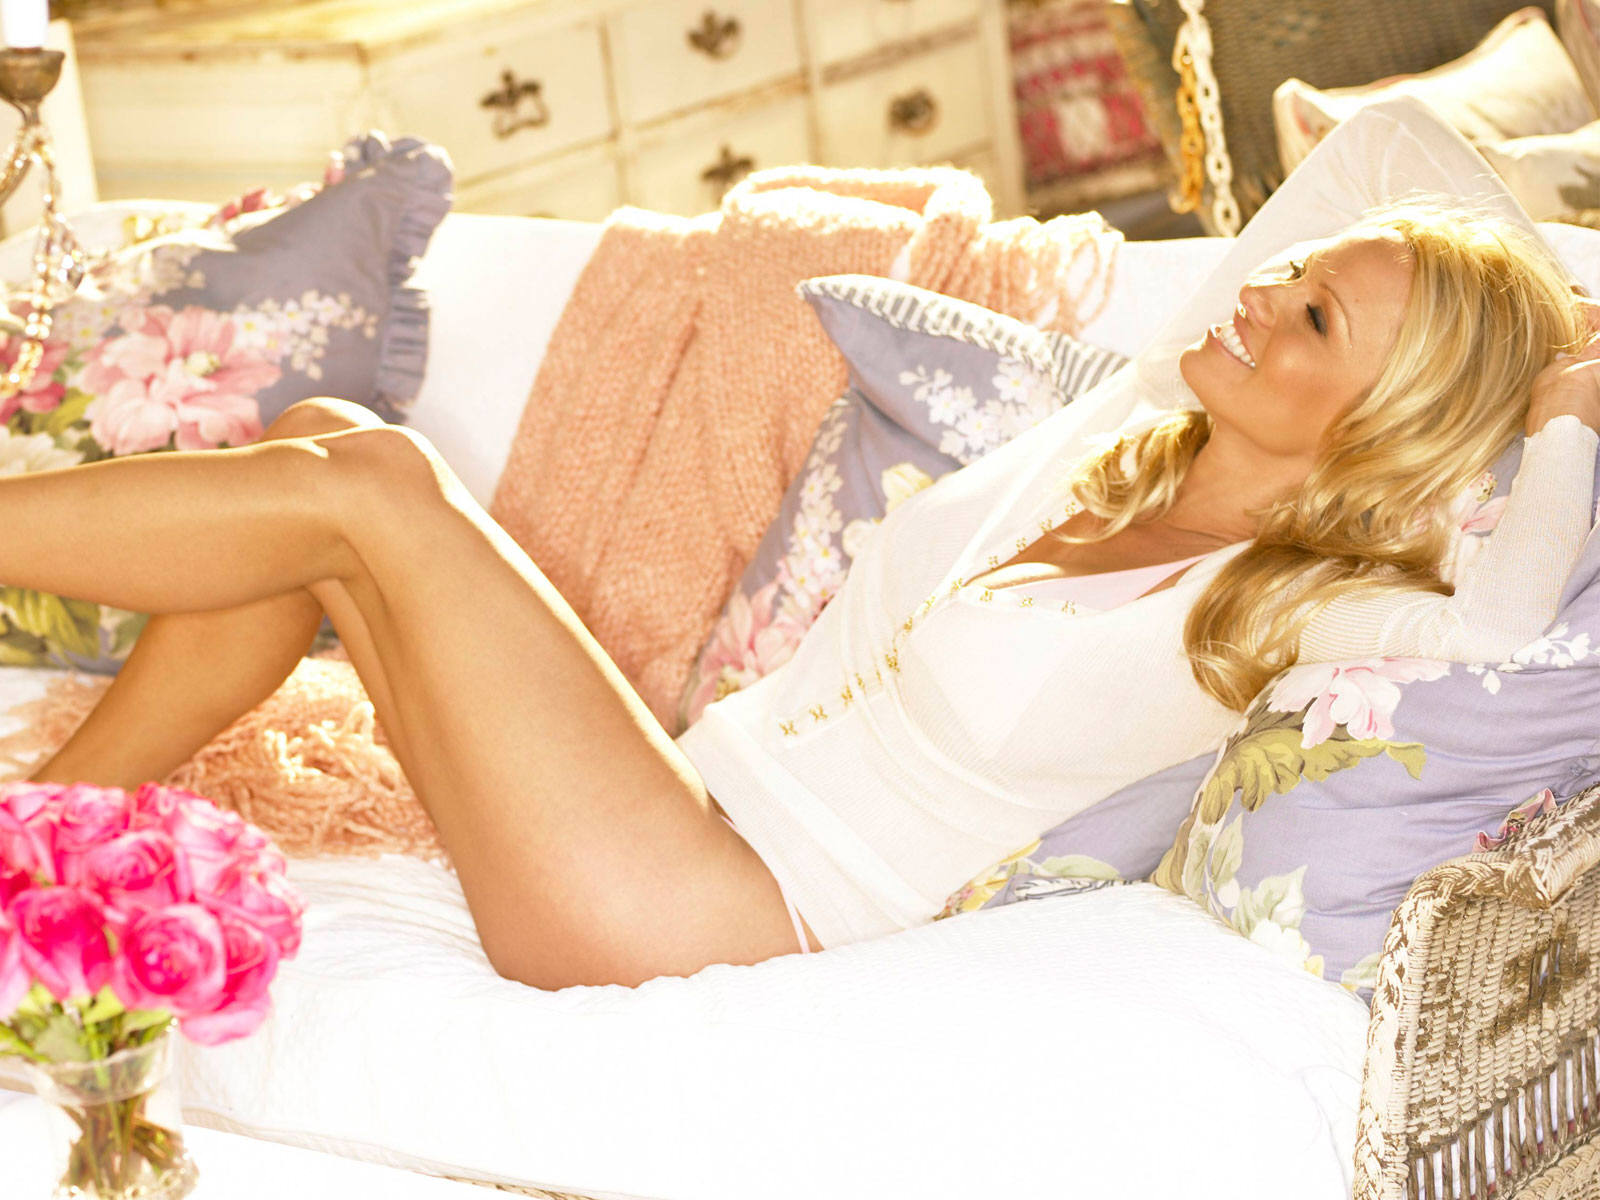 Pamela Anderson Hot Wallpapers Free Download